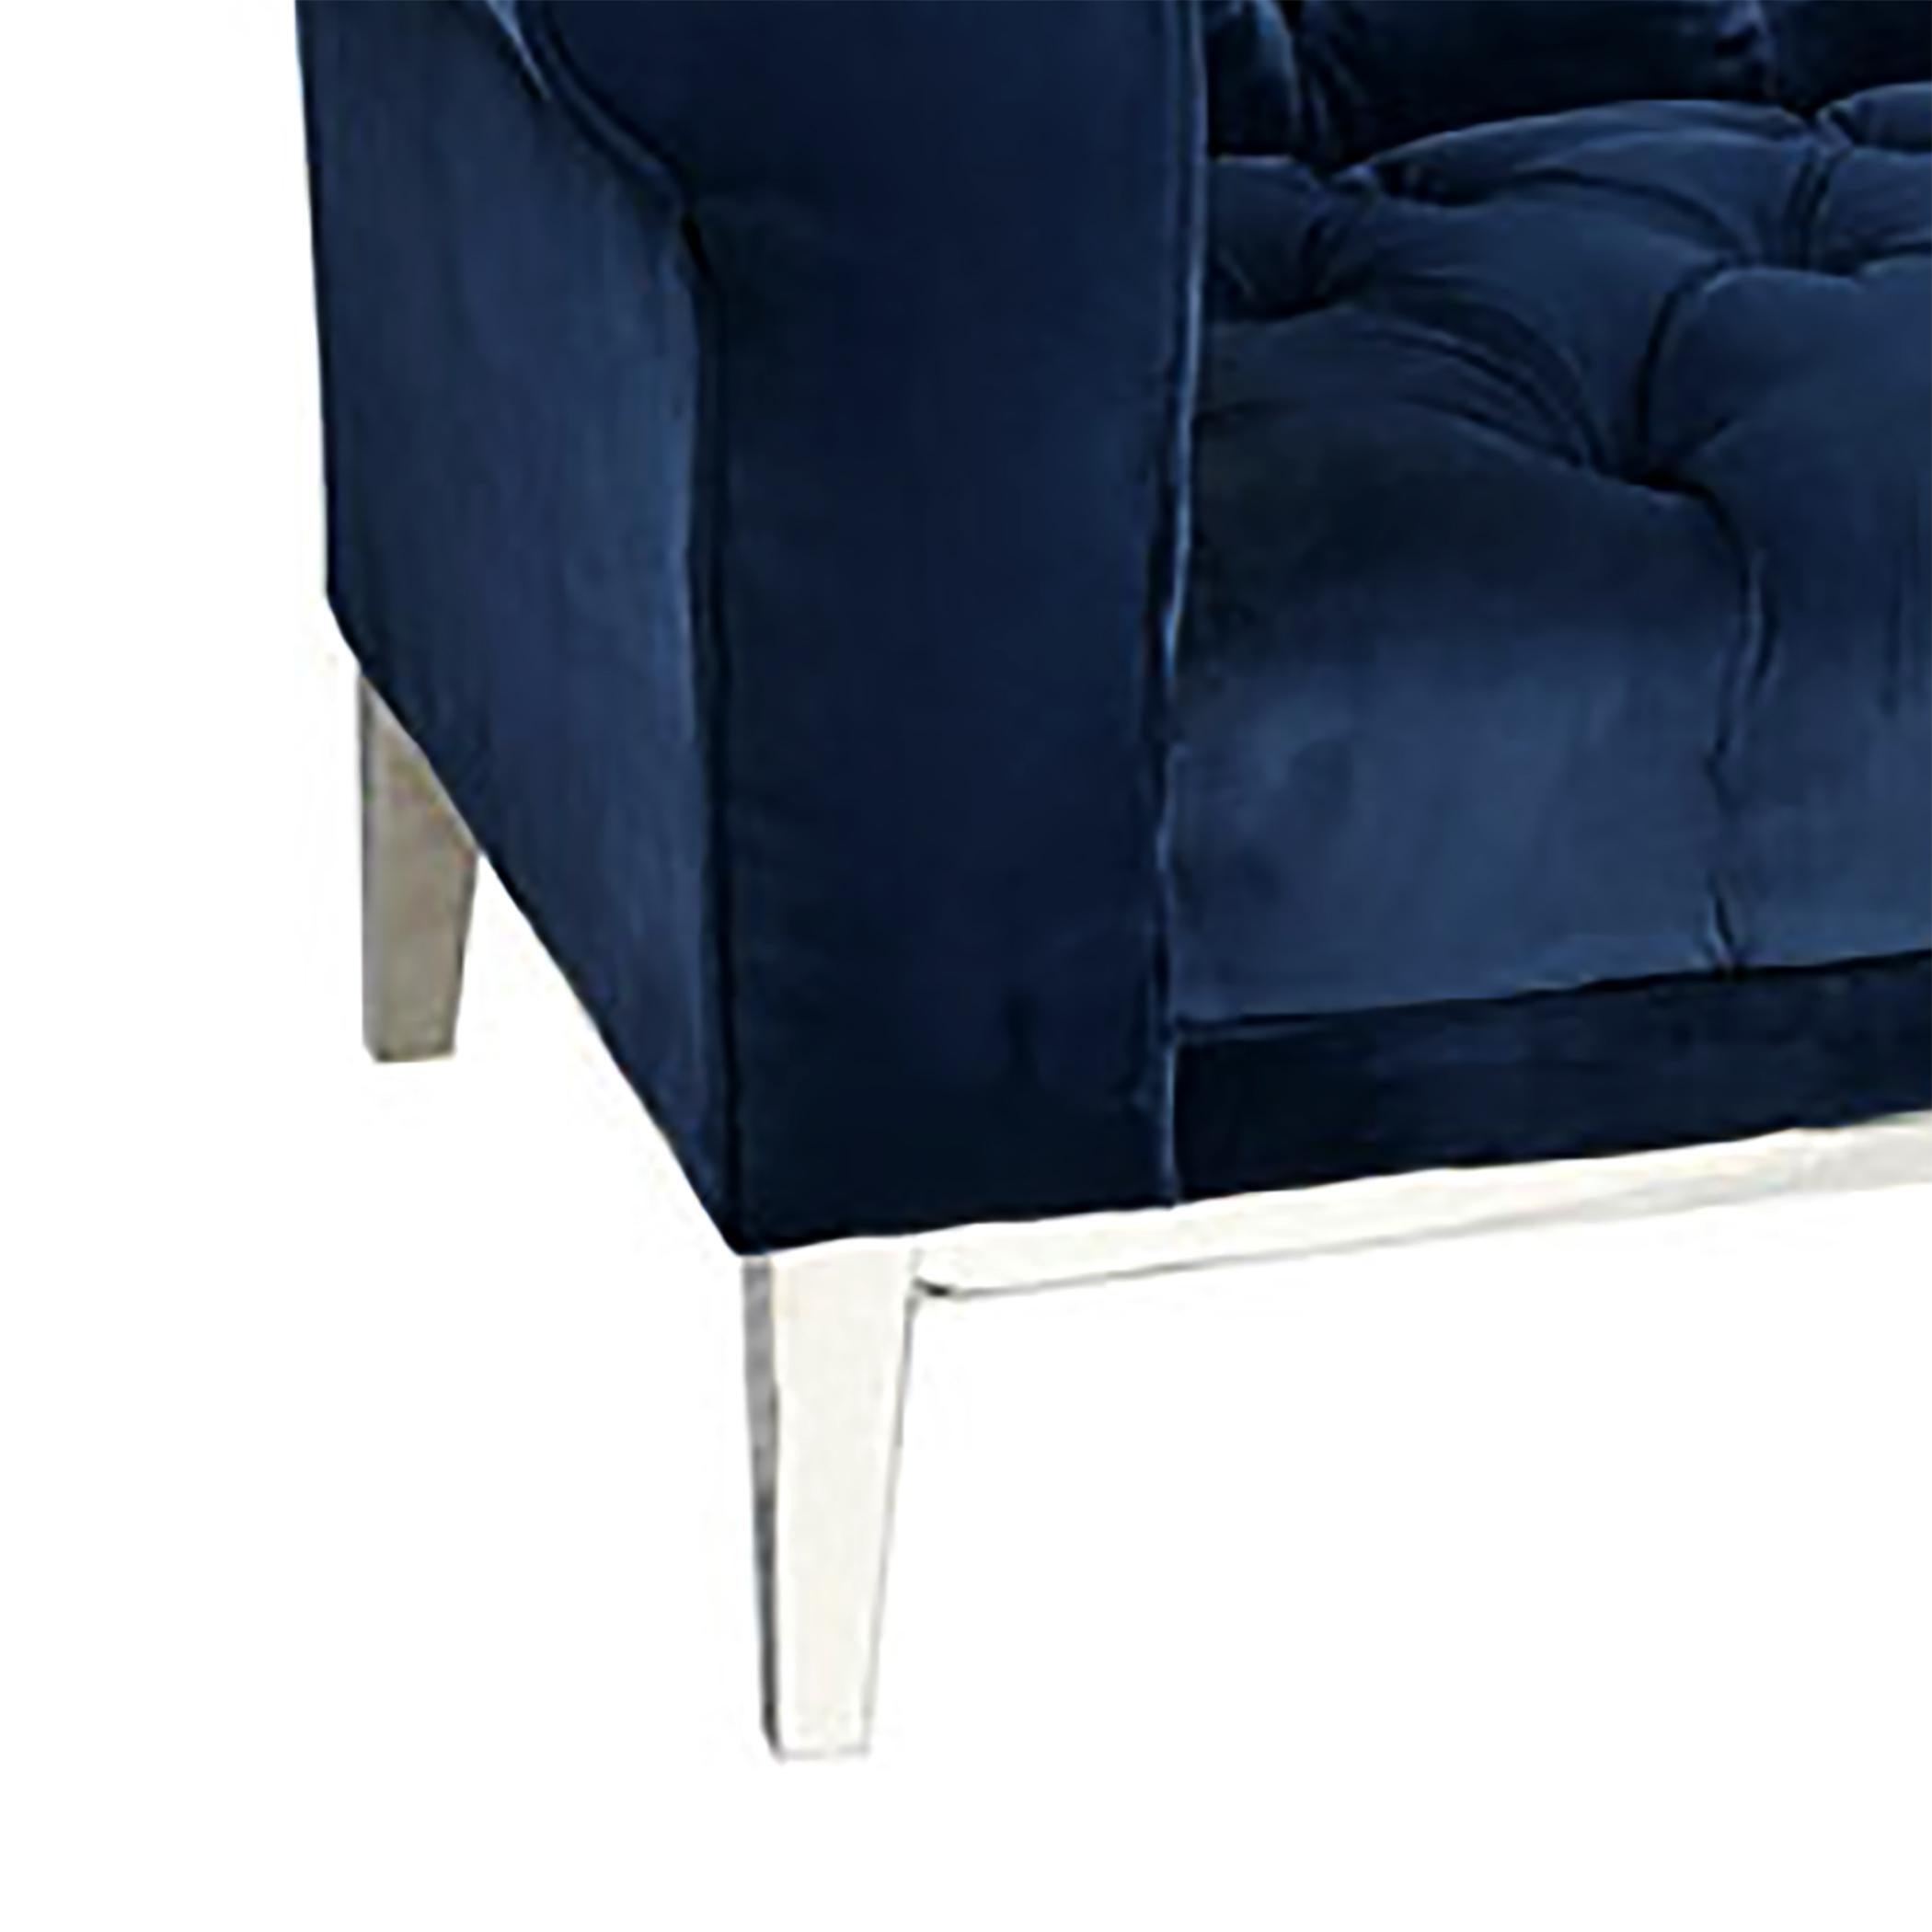 A Navy Blue Velvet Chesterfield Sofa Made Of Stainless Steel And Foam And Velvet  Fabric.